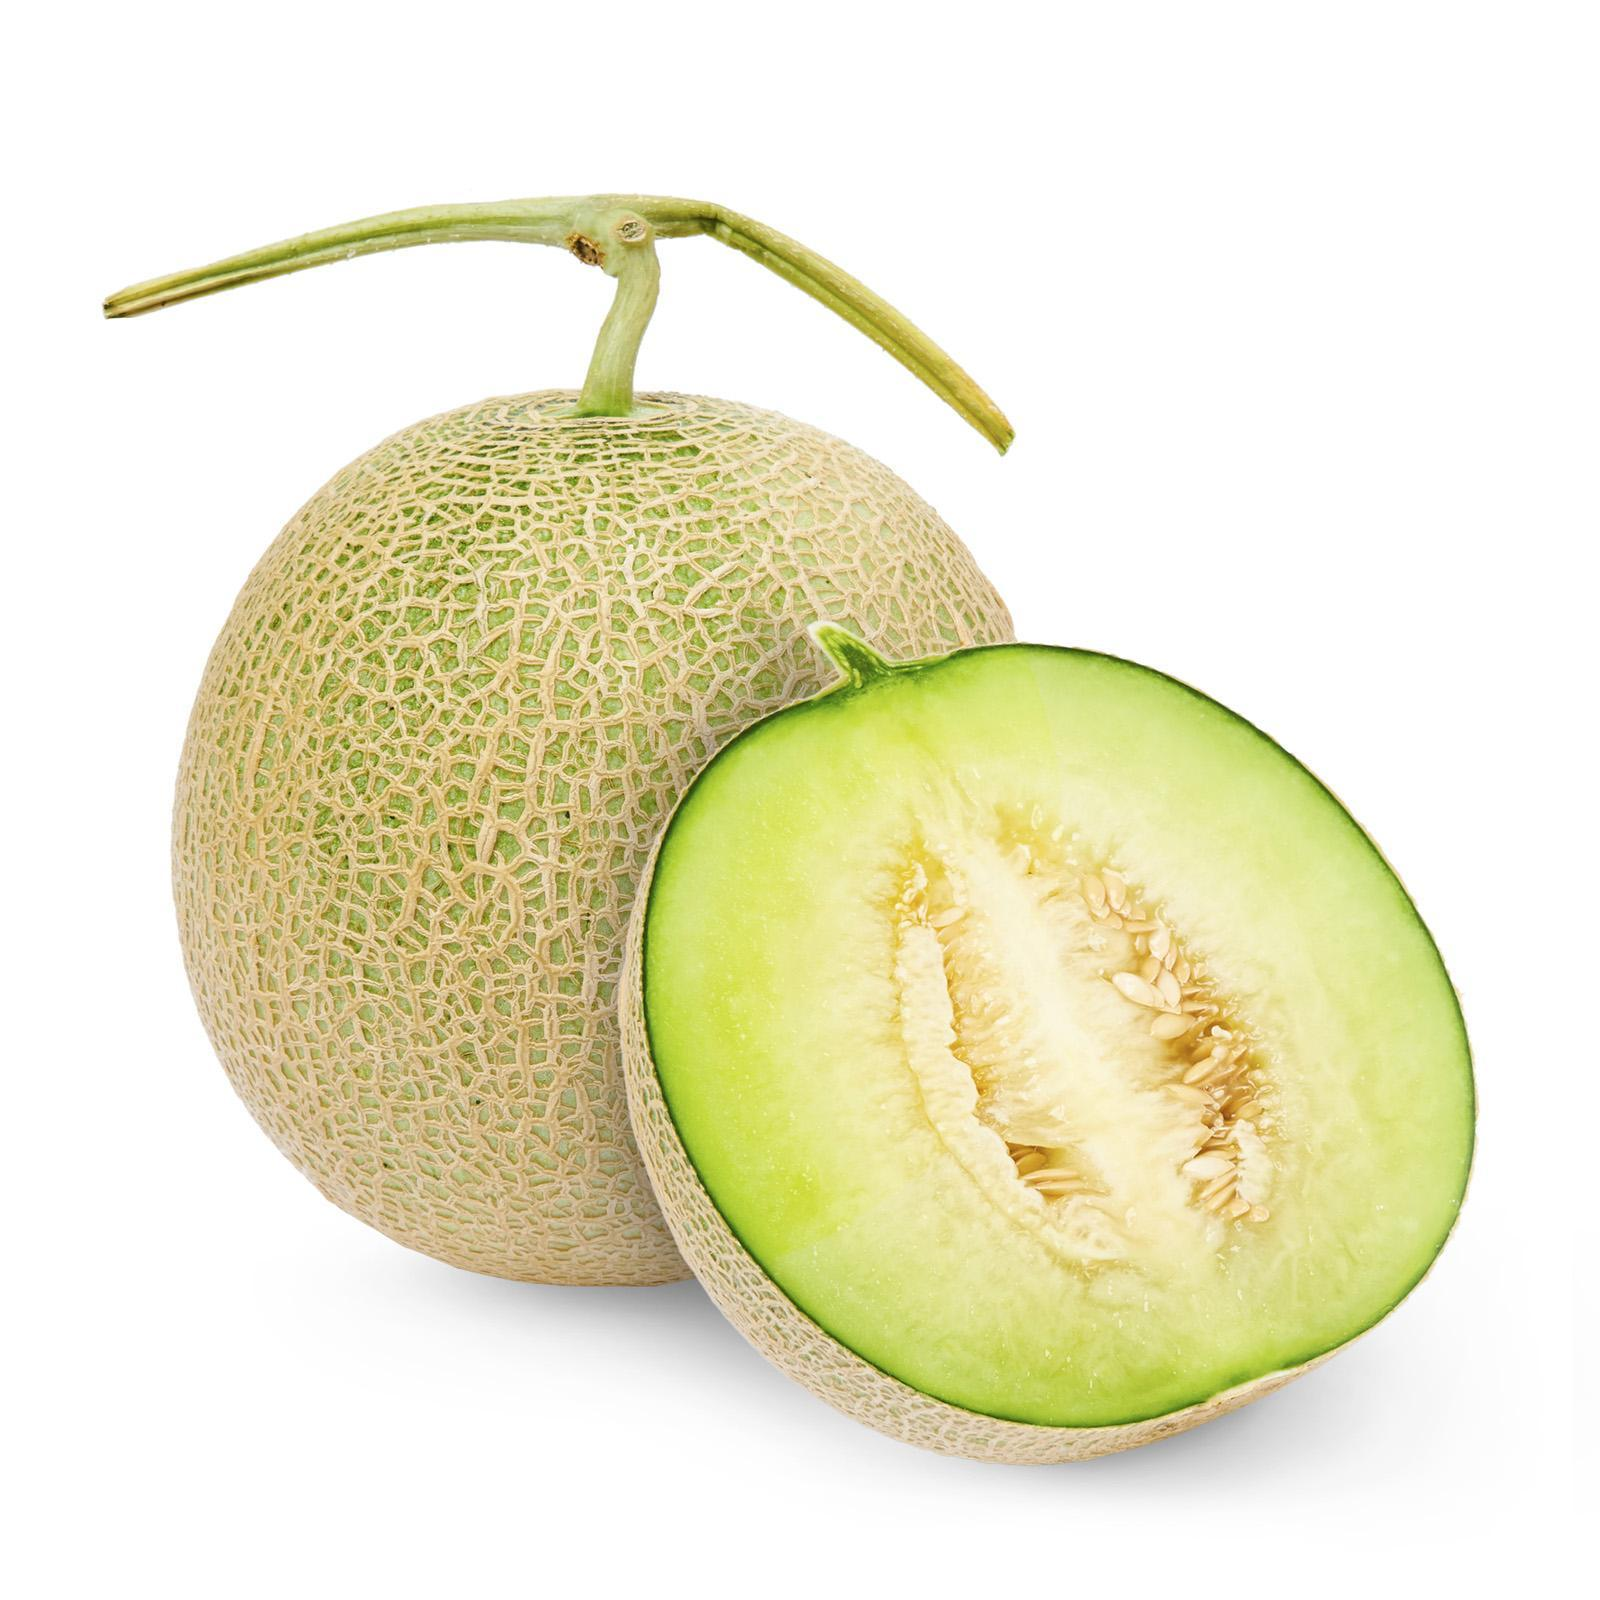 Kirei Japan Premium Fruits - Hokkaido Musk Melon (green) By Redmart.